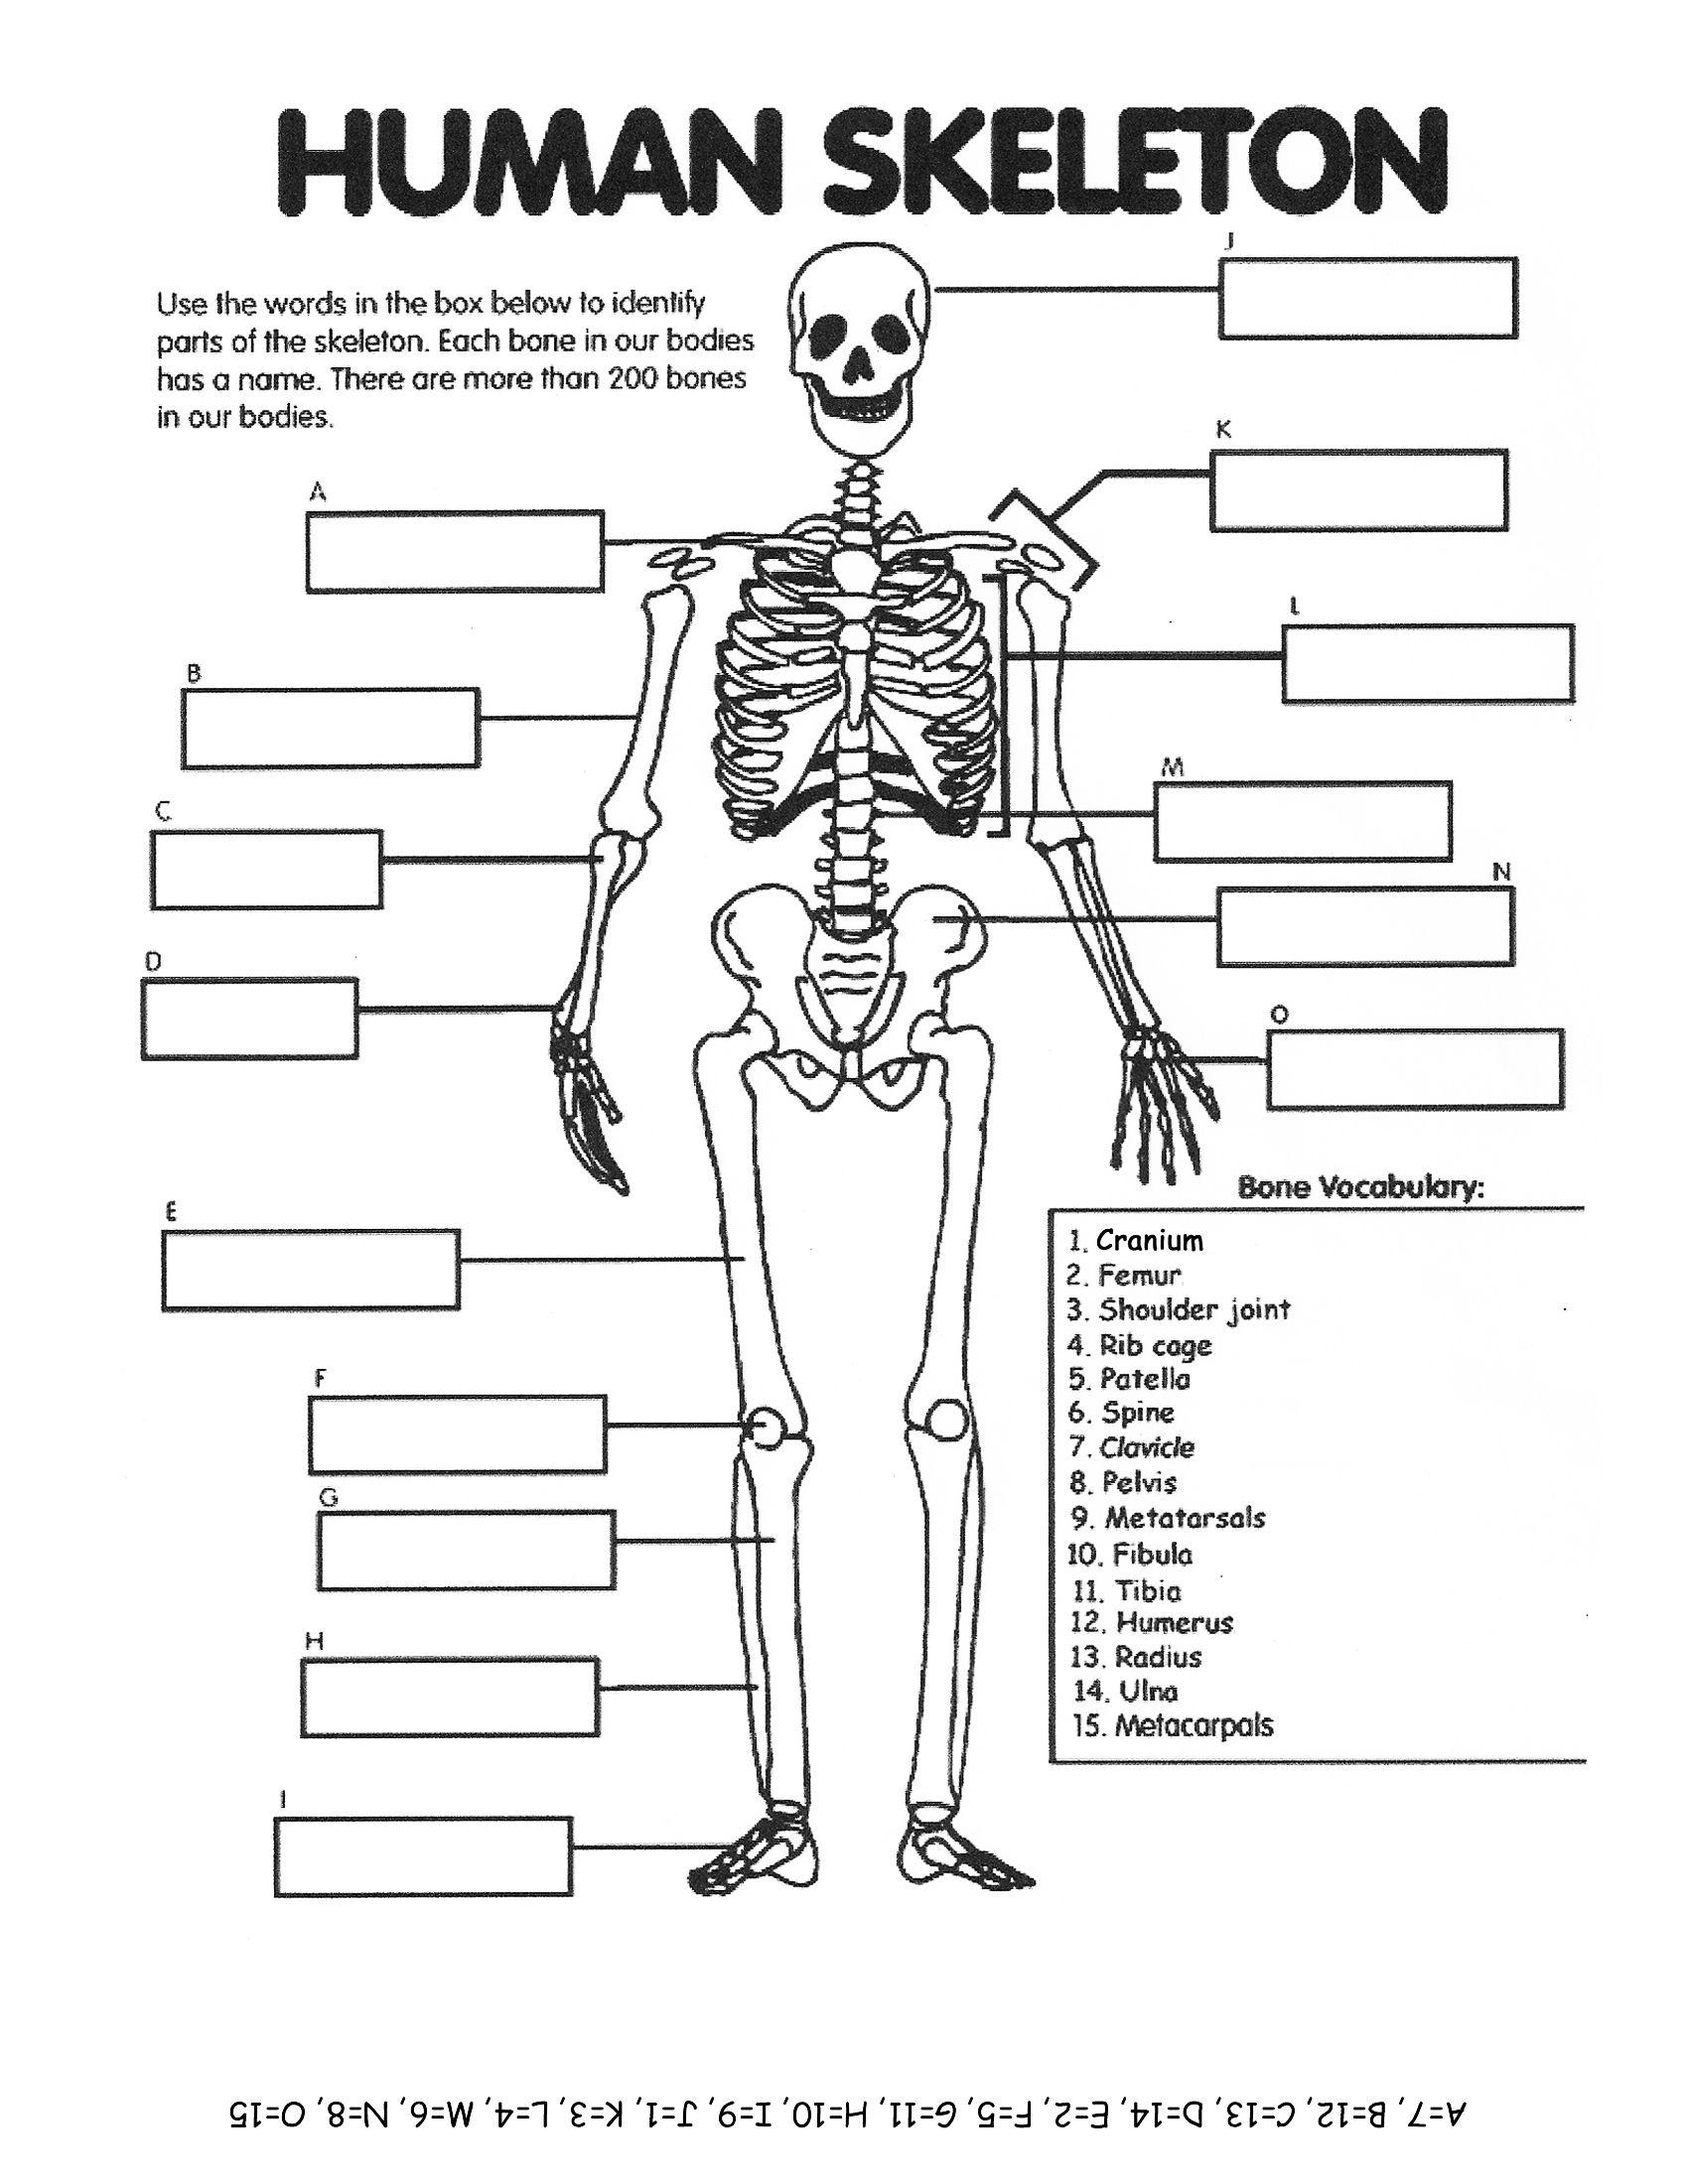 No Link Human Skeleton Elementary Worksheet Human Body Systems Human Body Unit Human Body